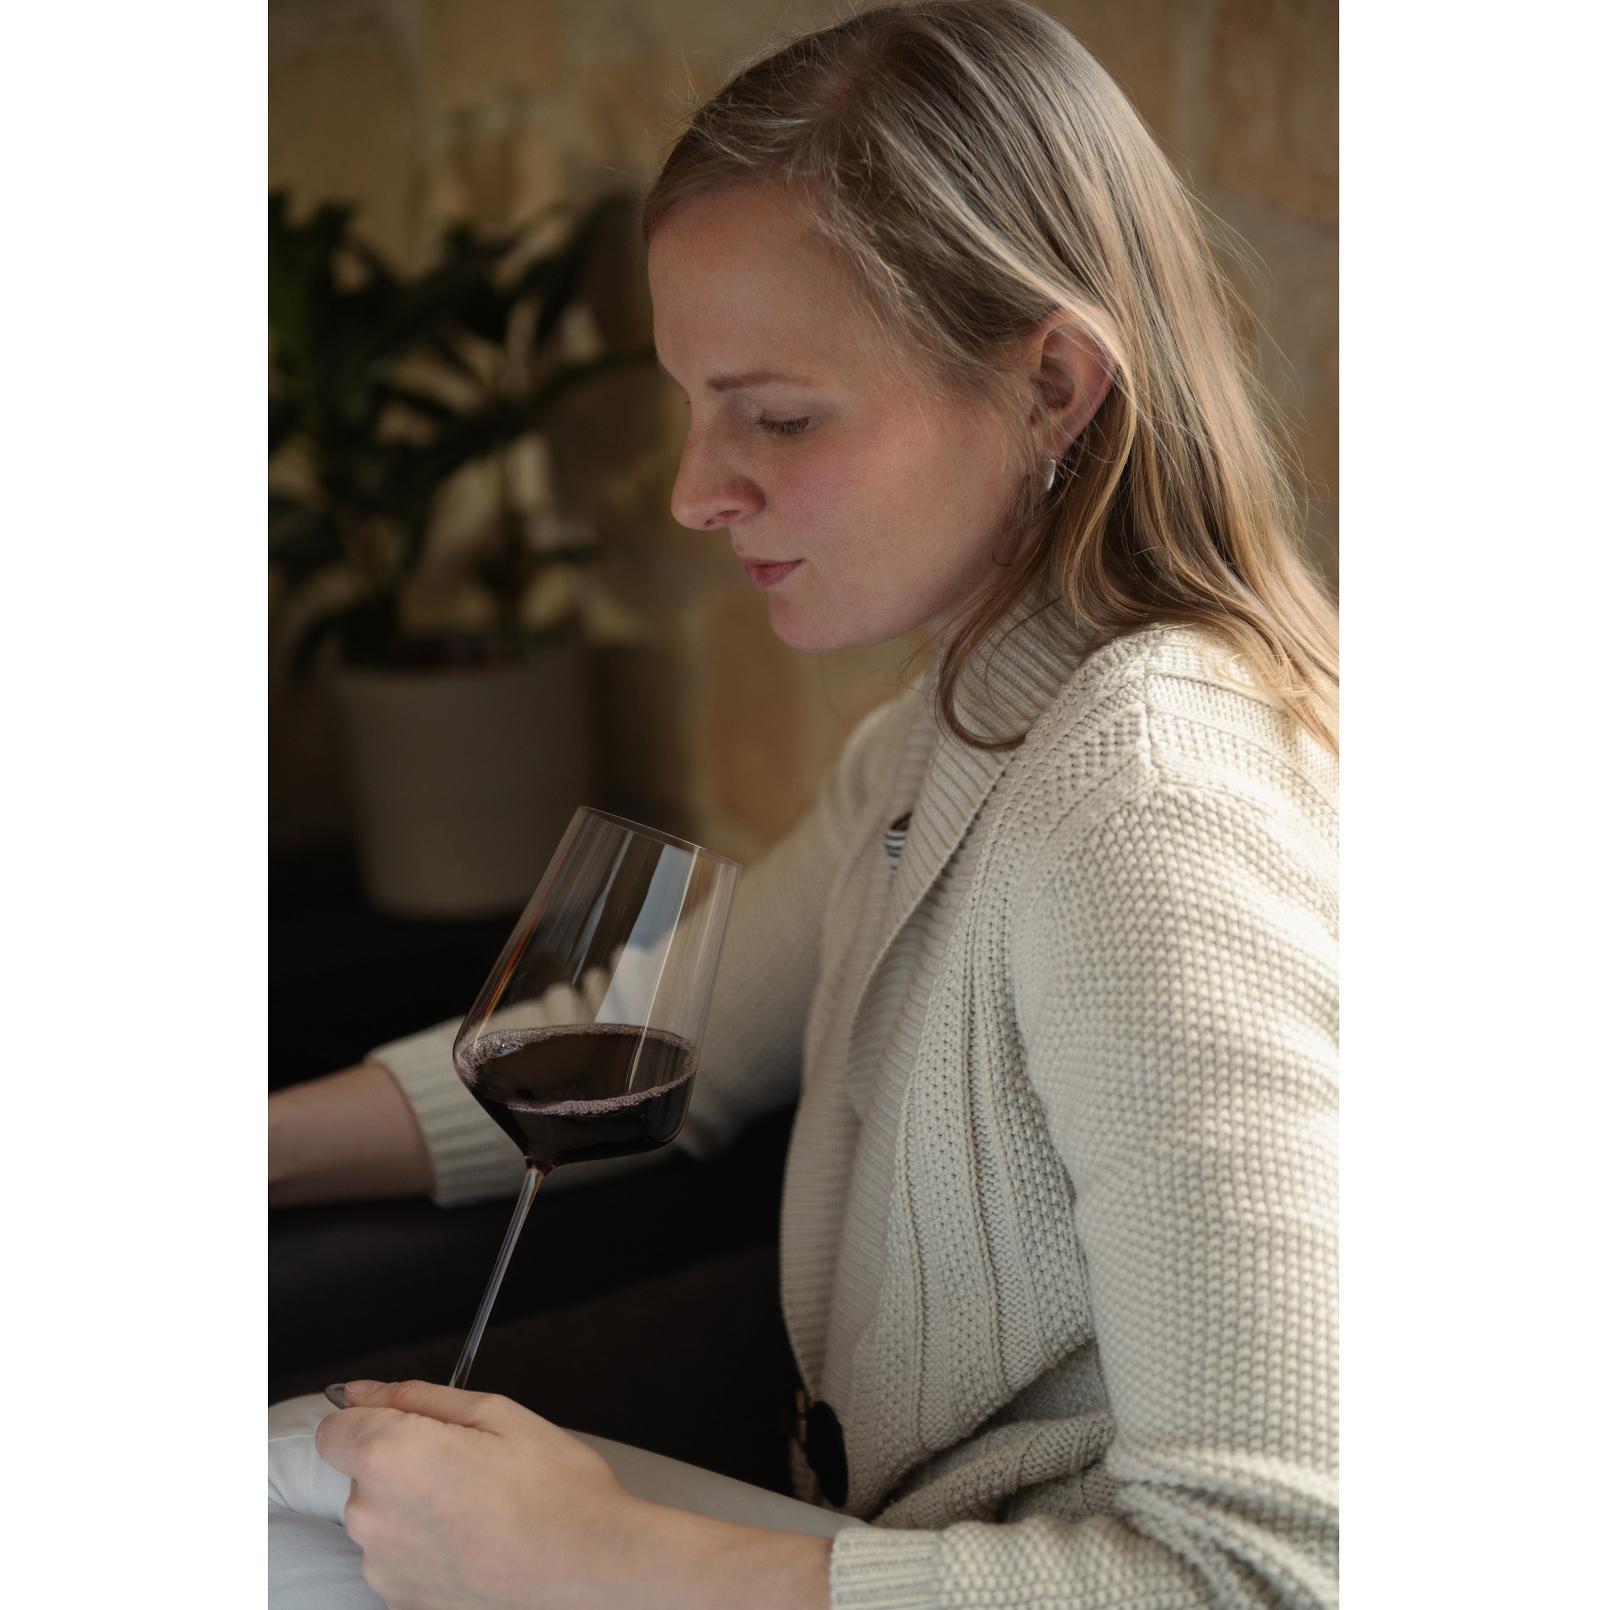 Christina Thiblet Baldwin Commercial Wine Photographer